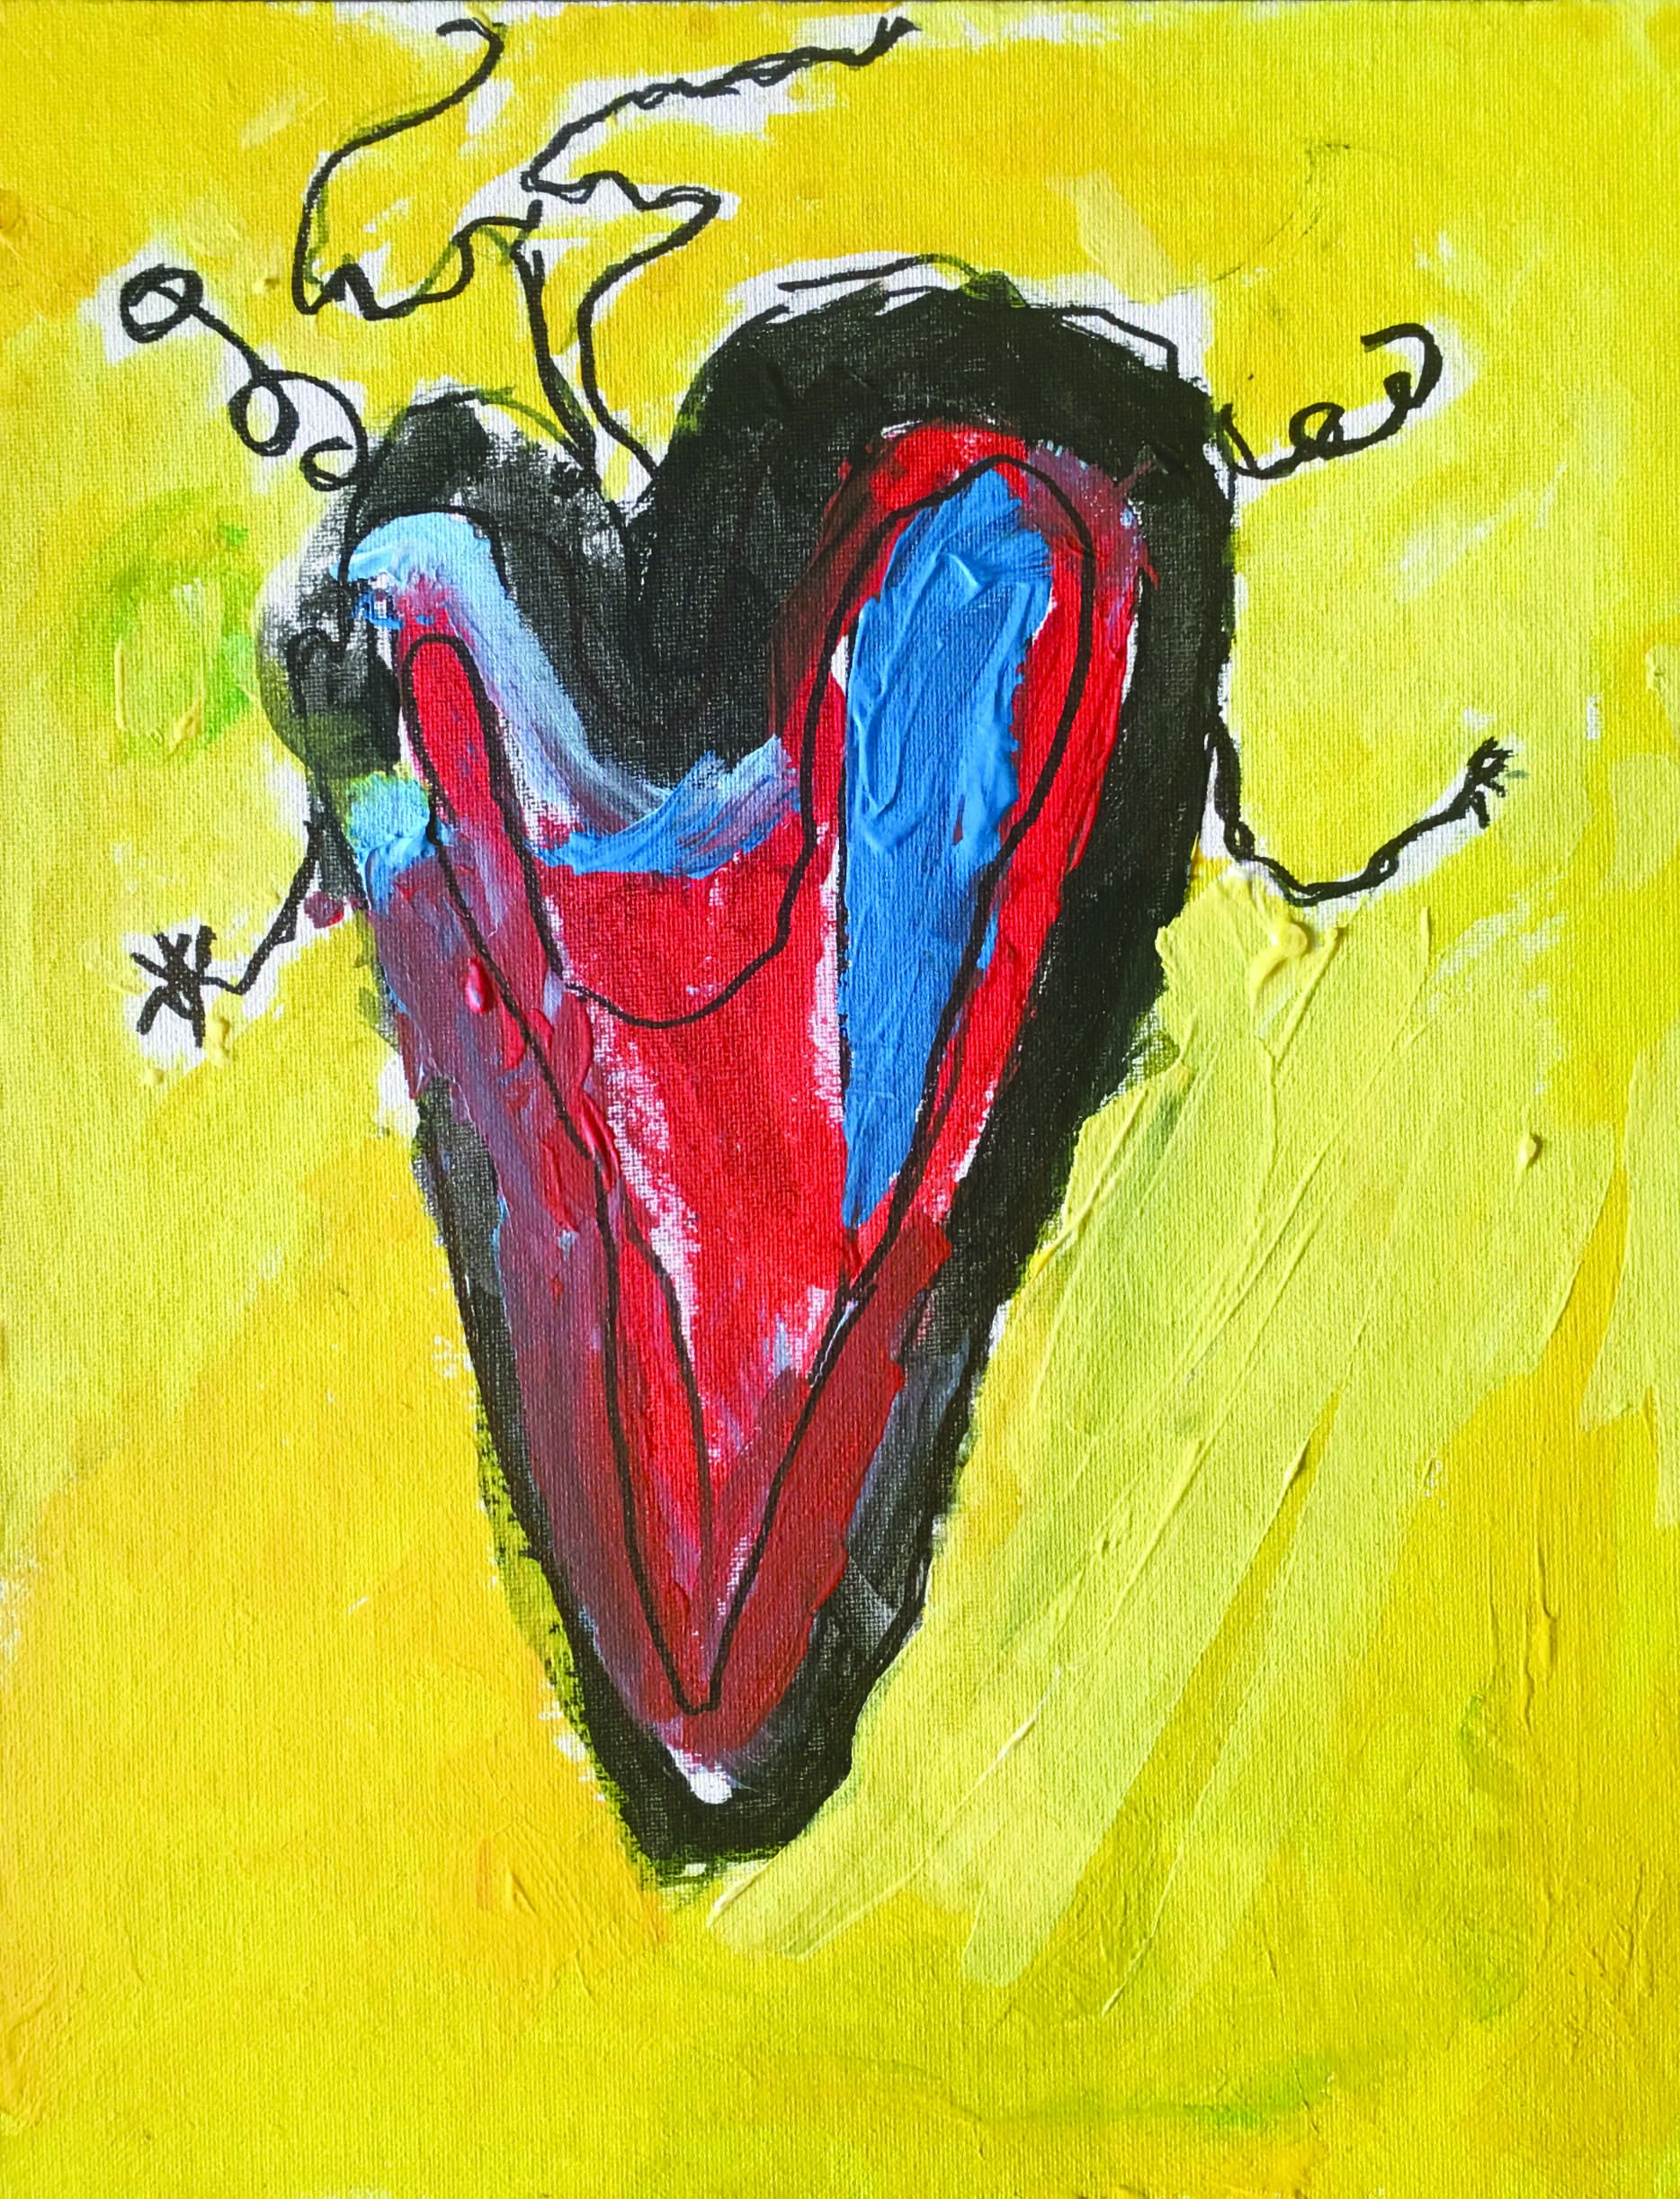 Heart_LAMB_CROP.jpg